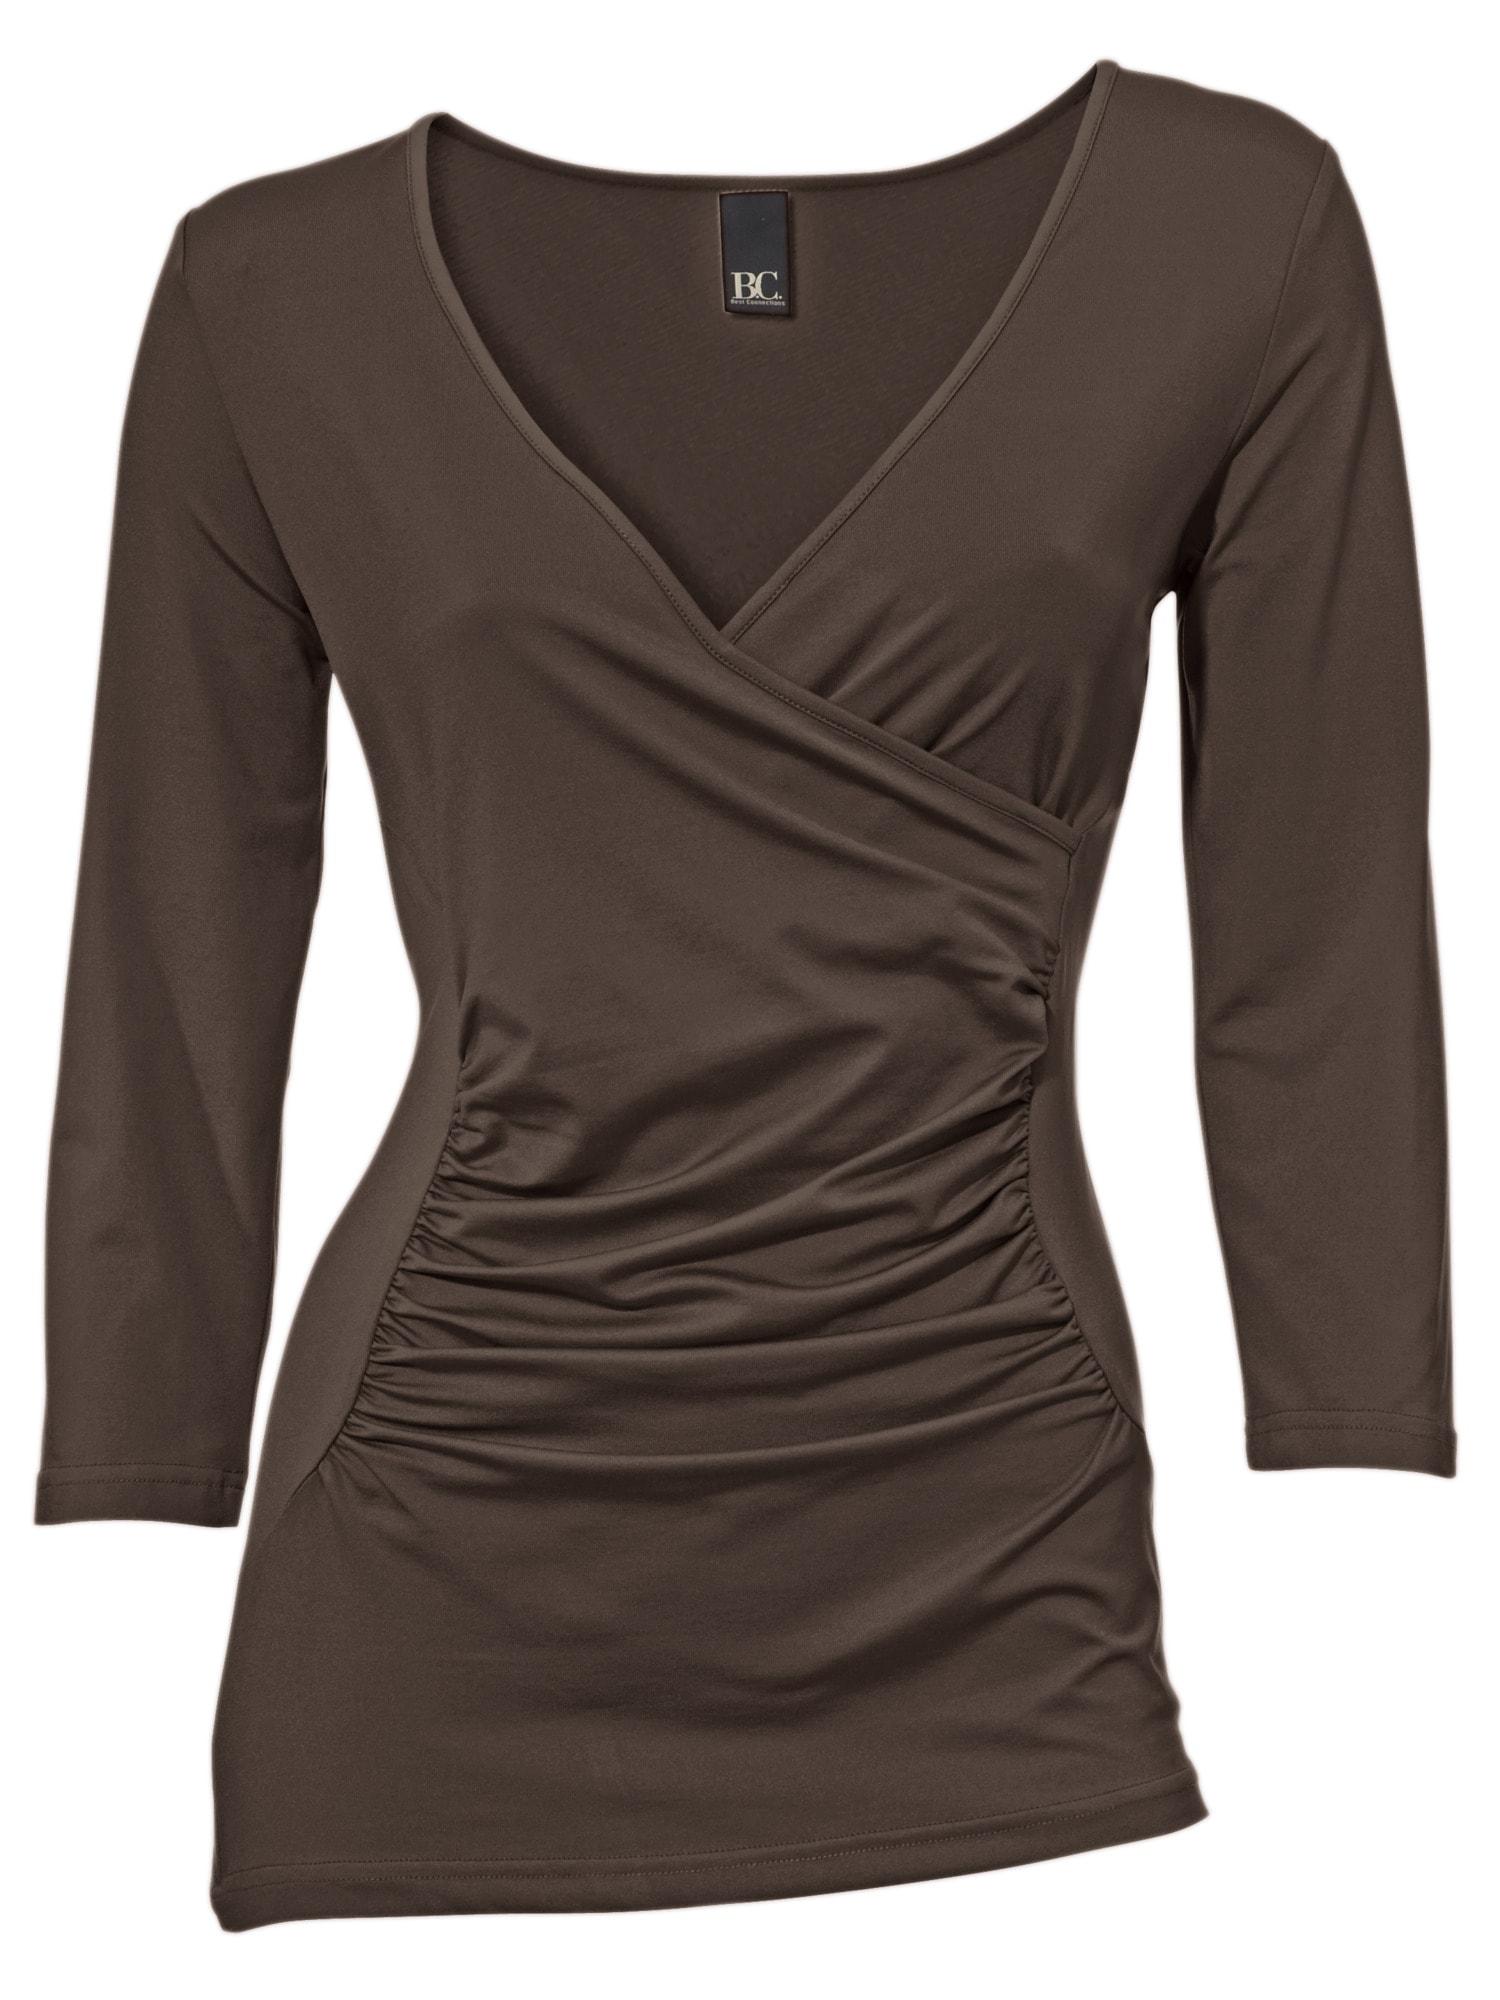 heine TIMELESS Wickelshirt Tactel | Bekleidung > Shirts > Wickelshirts | Braun | Ca - Elasthan | Heine Timeless